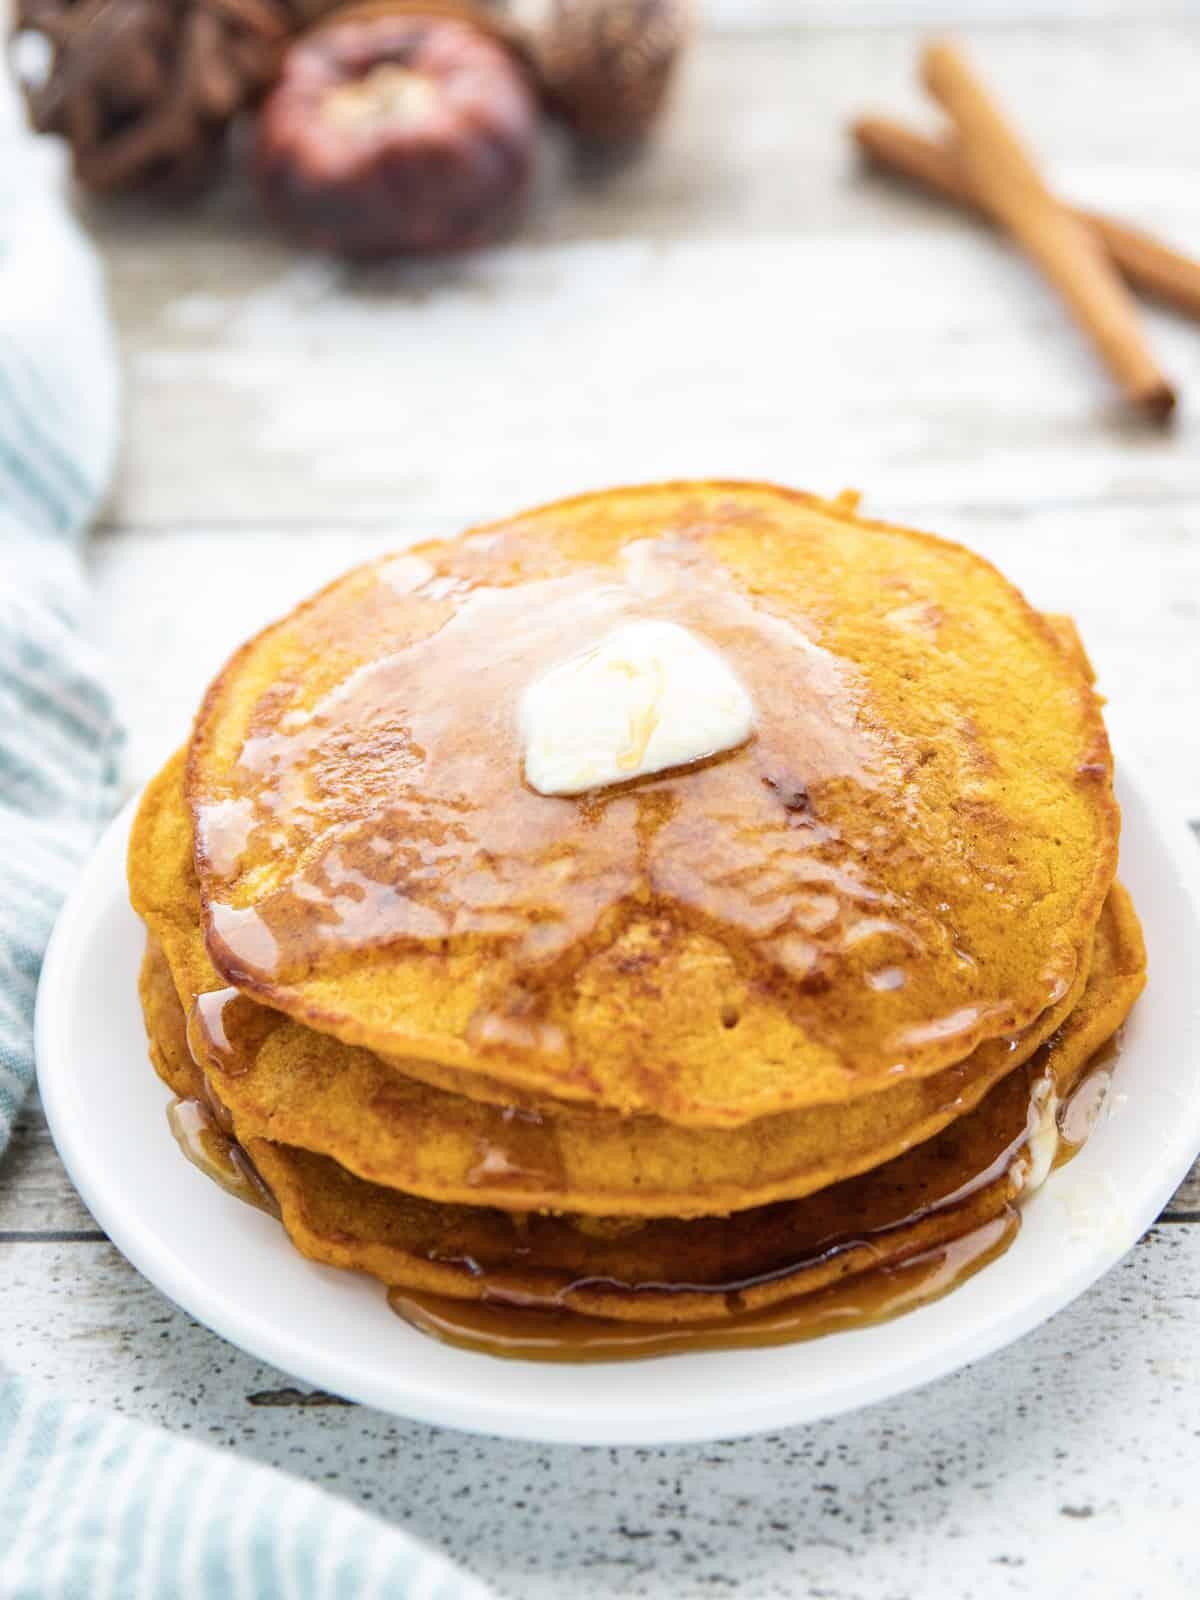 Tasty Pumpkin Spice Pancakes